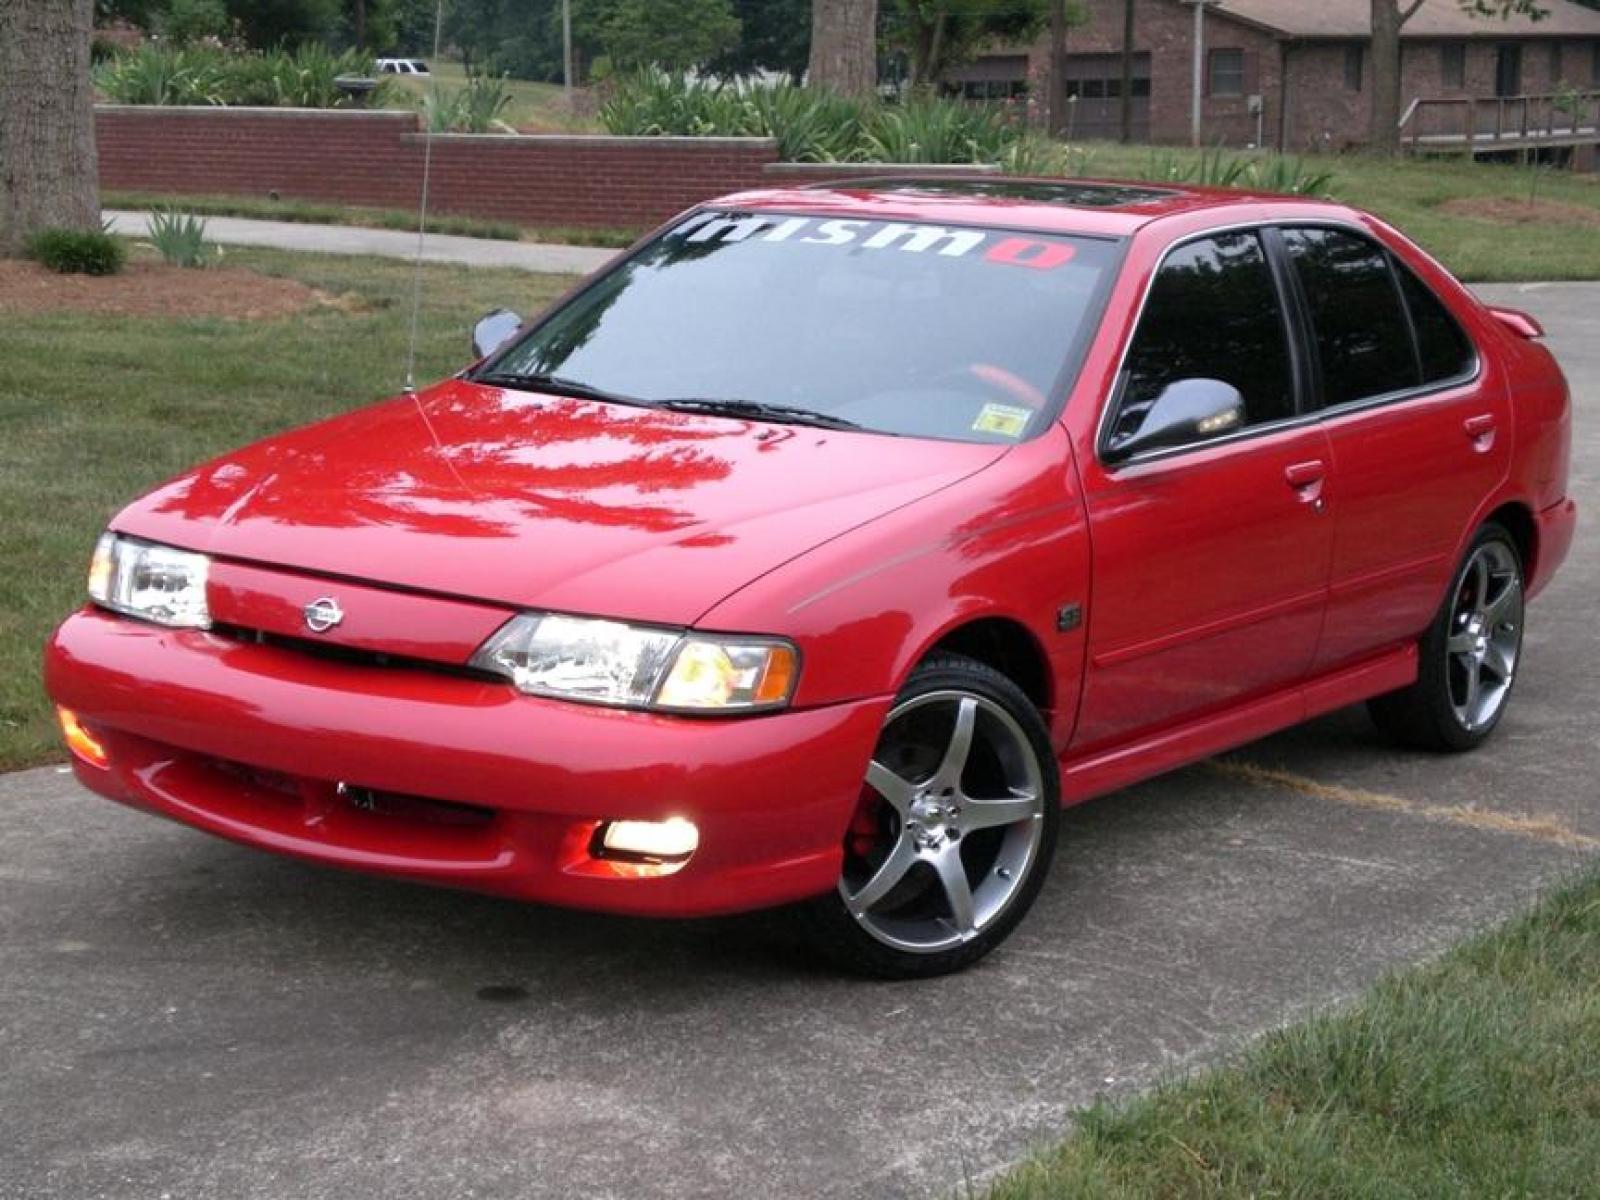 1999 Nissan Sentra Information And Photos Zomb Drive